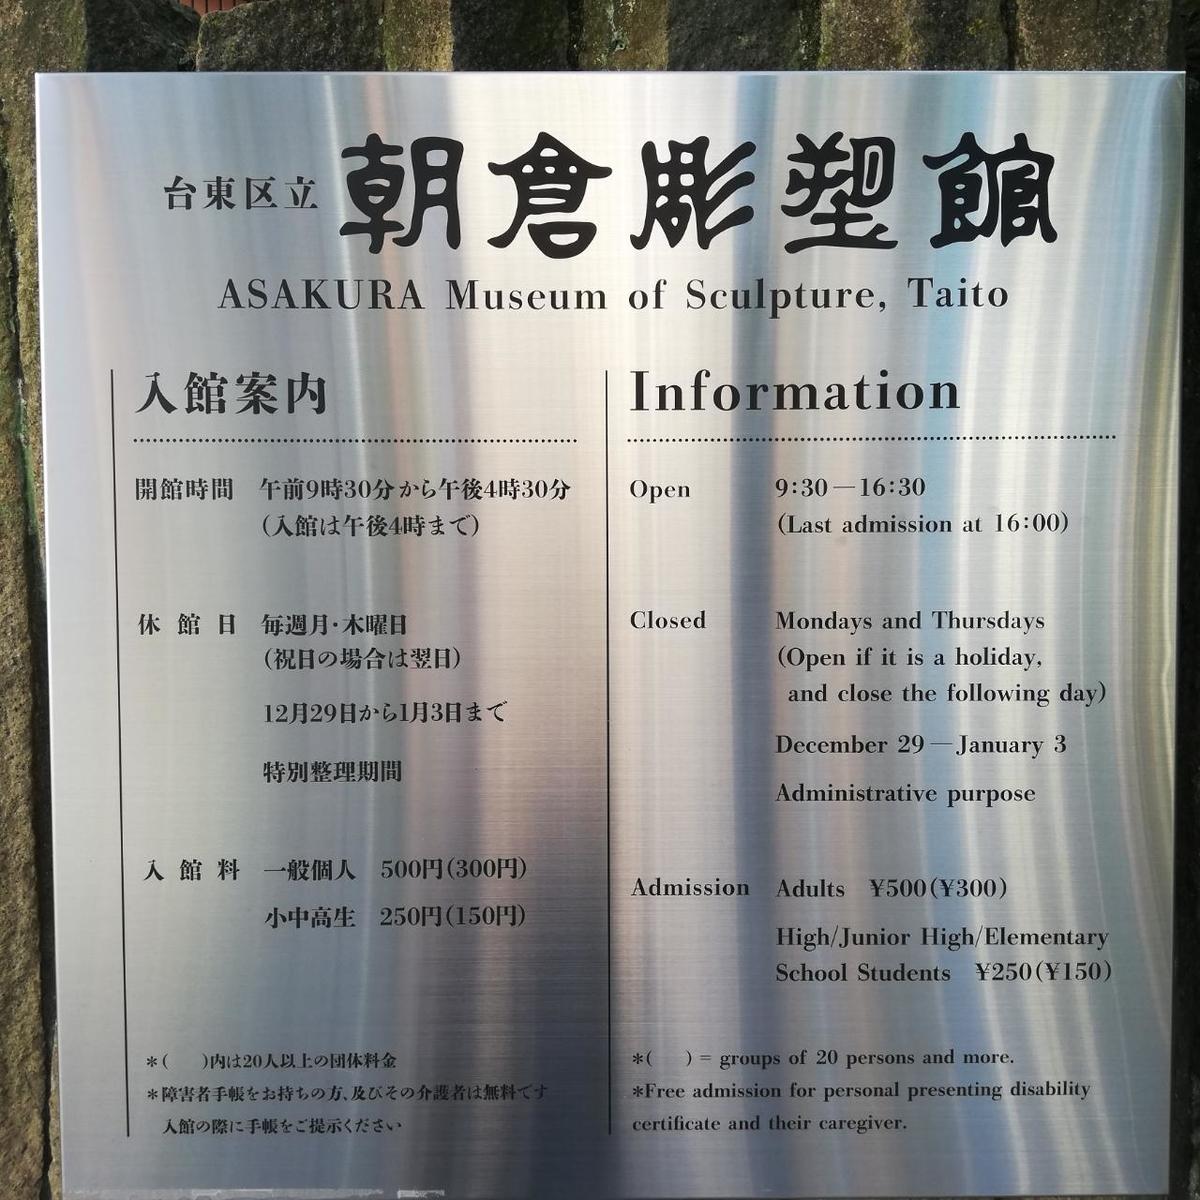 朝倉彫塑館入館時の注意